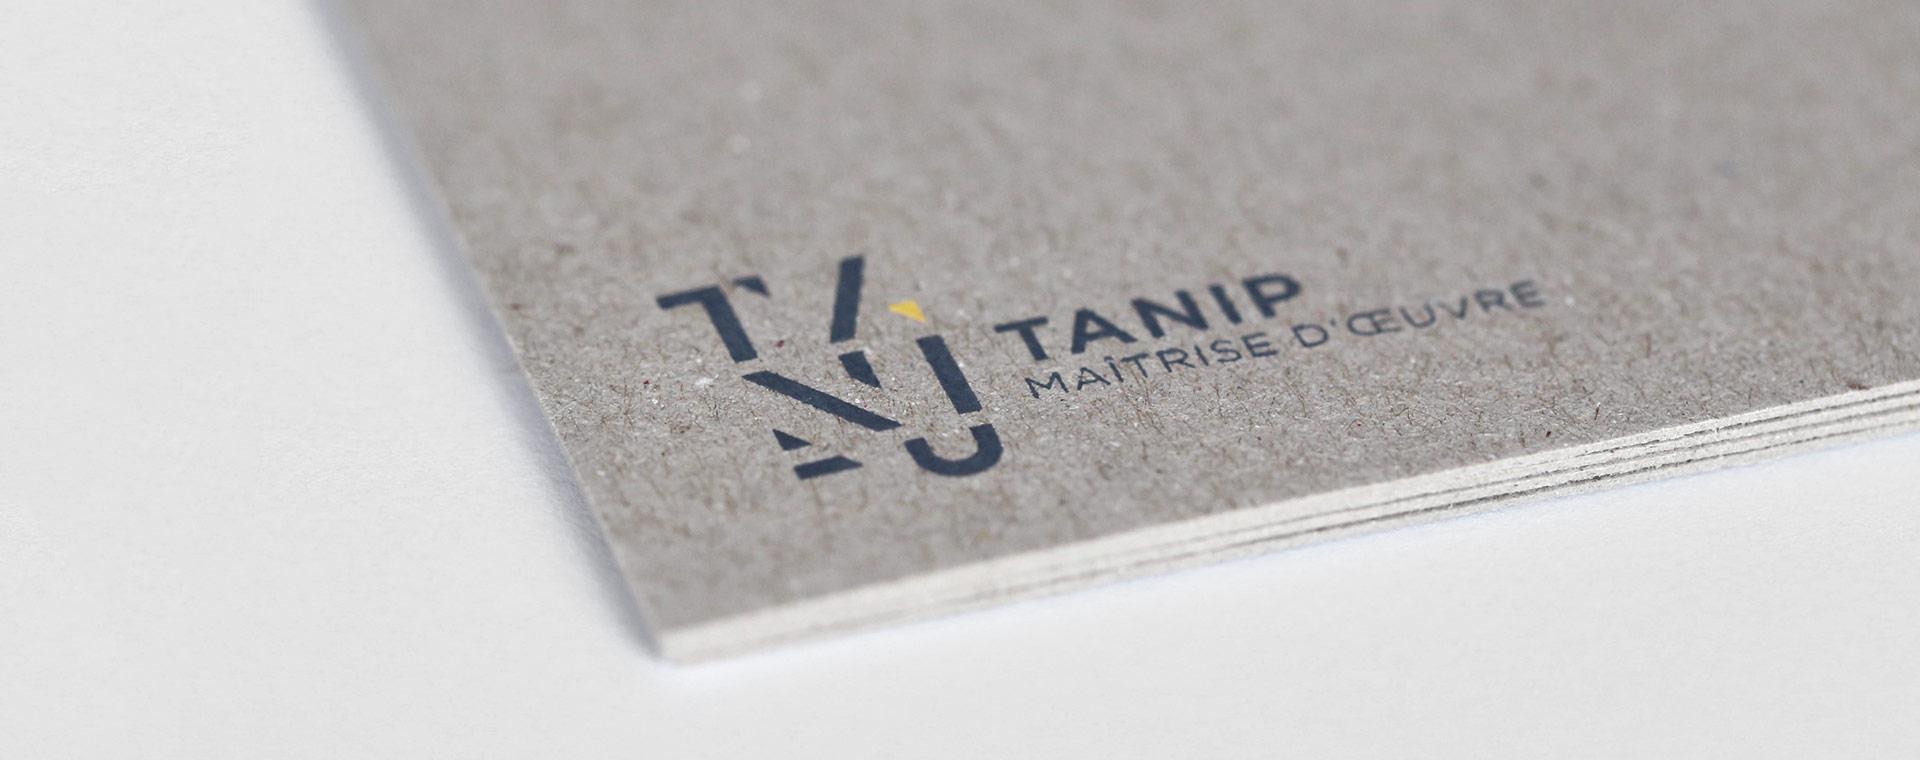 tanip-maitrise-d-oeuvre-epok-design-carte-de-visite